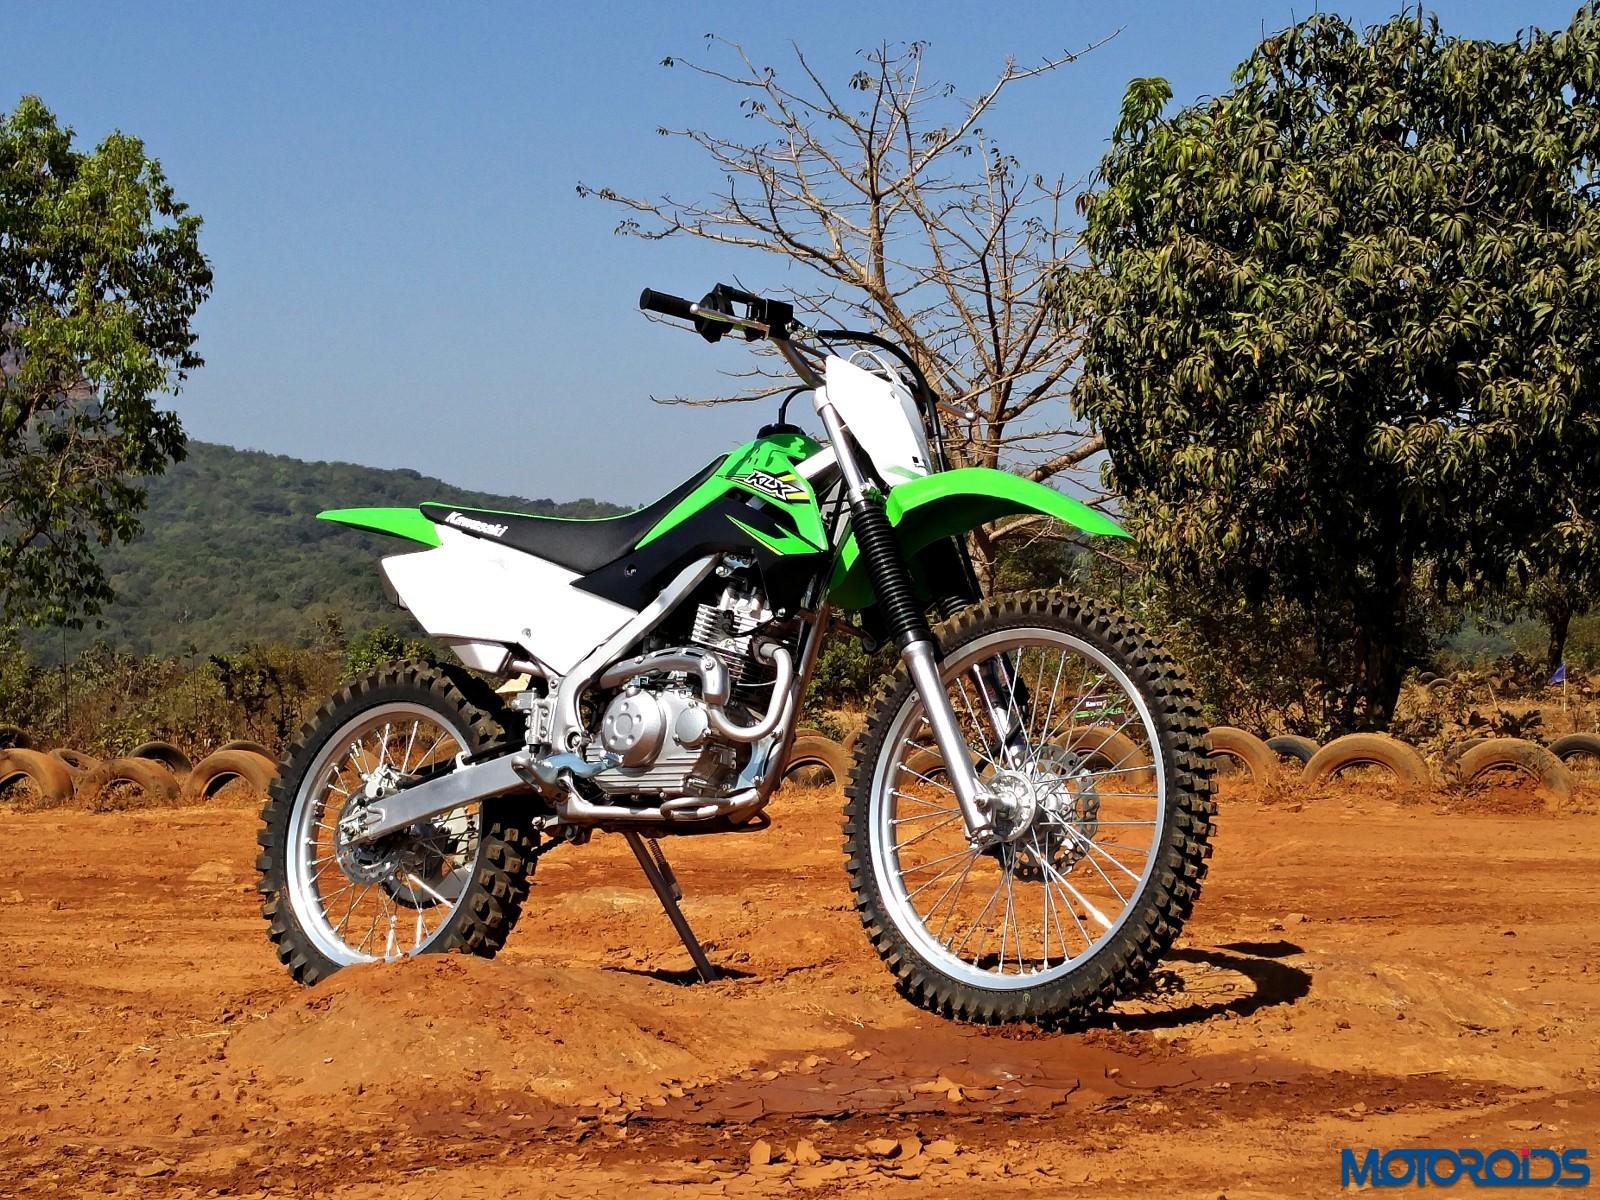 Kawasaki-KLX140G-Ride-Experience-38